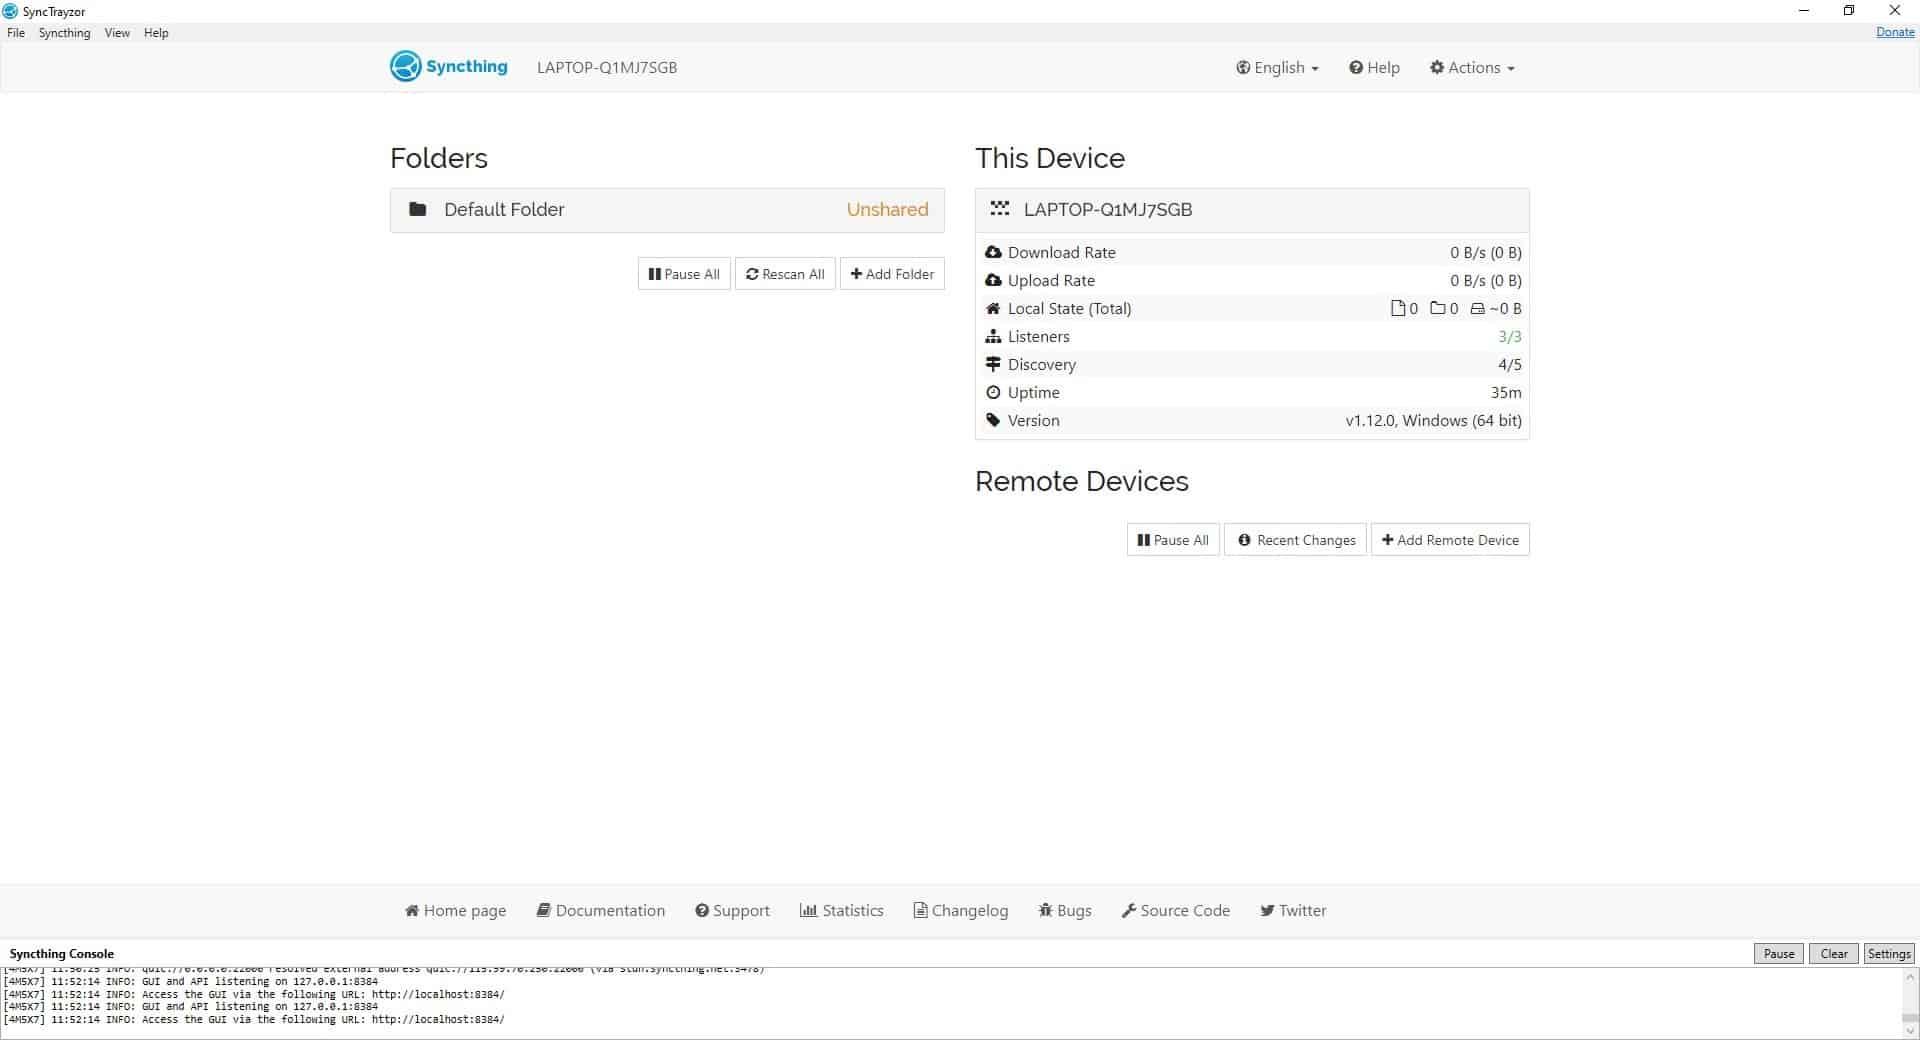 SyncTrazor interface